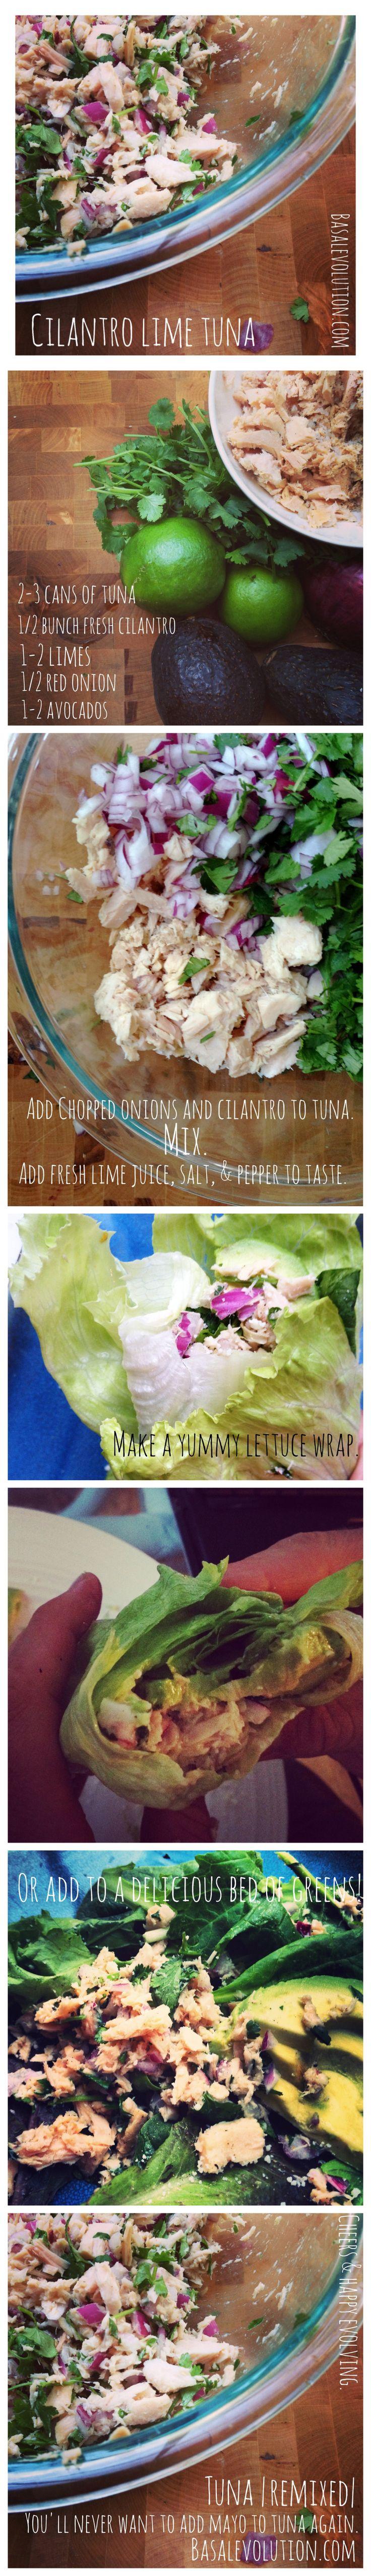 Keto friendly: amazingly delicious tuna recipe (with cilantro and lime) no mayonnaise needed!